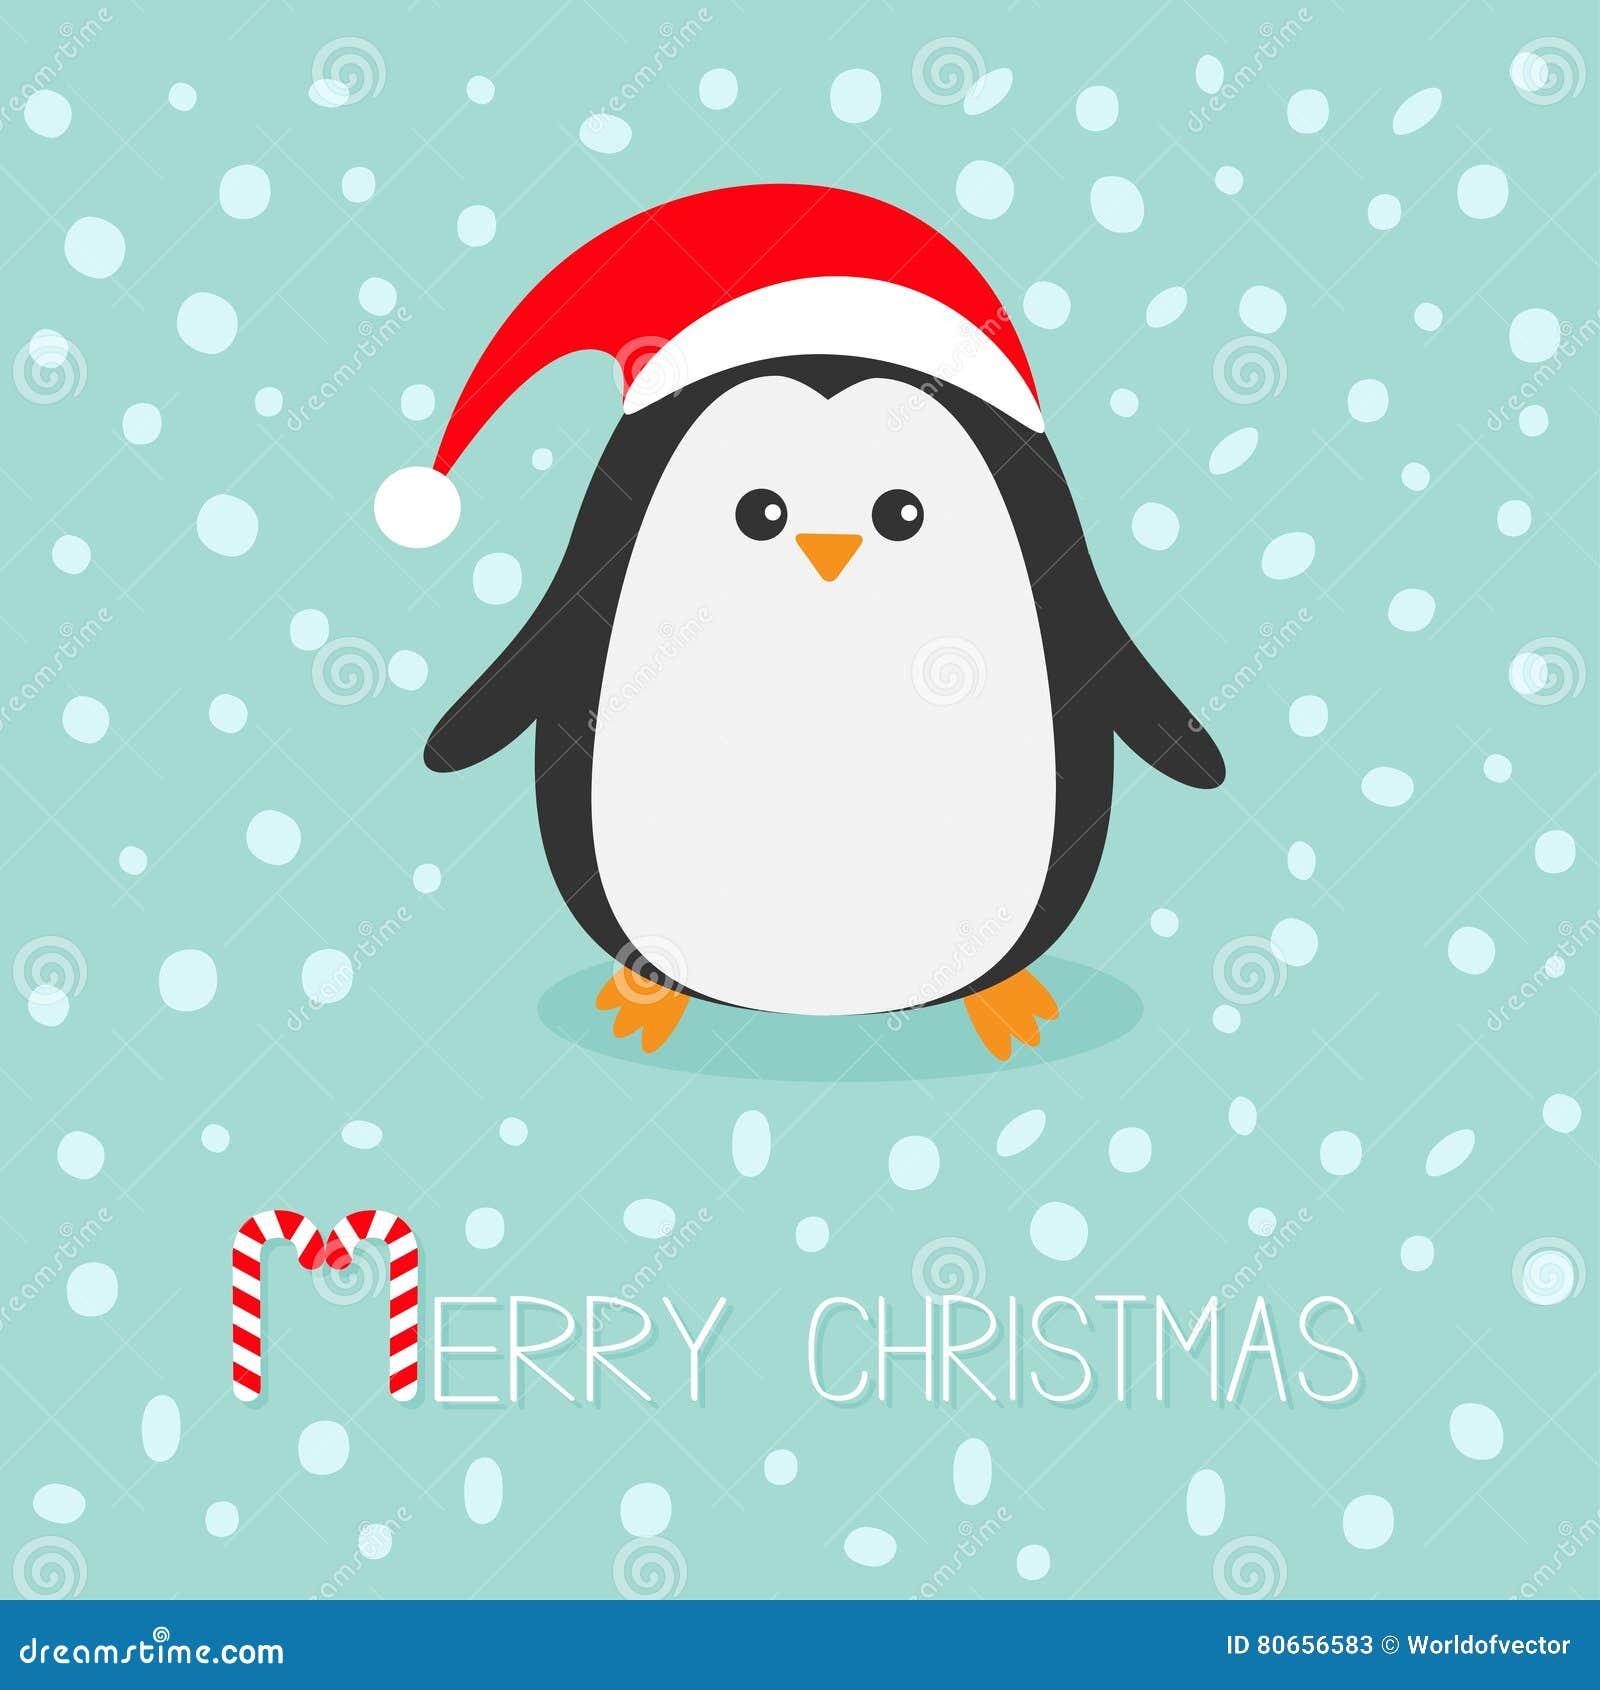 Coloriage Pingouin Kawaii.De Dessin Pingouin Type Stock Illustrations Vecteurs Clipart